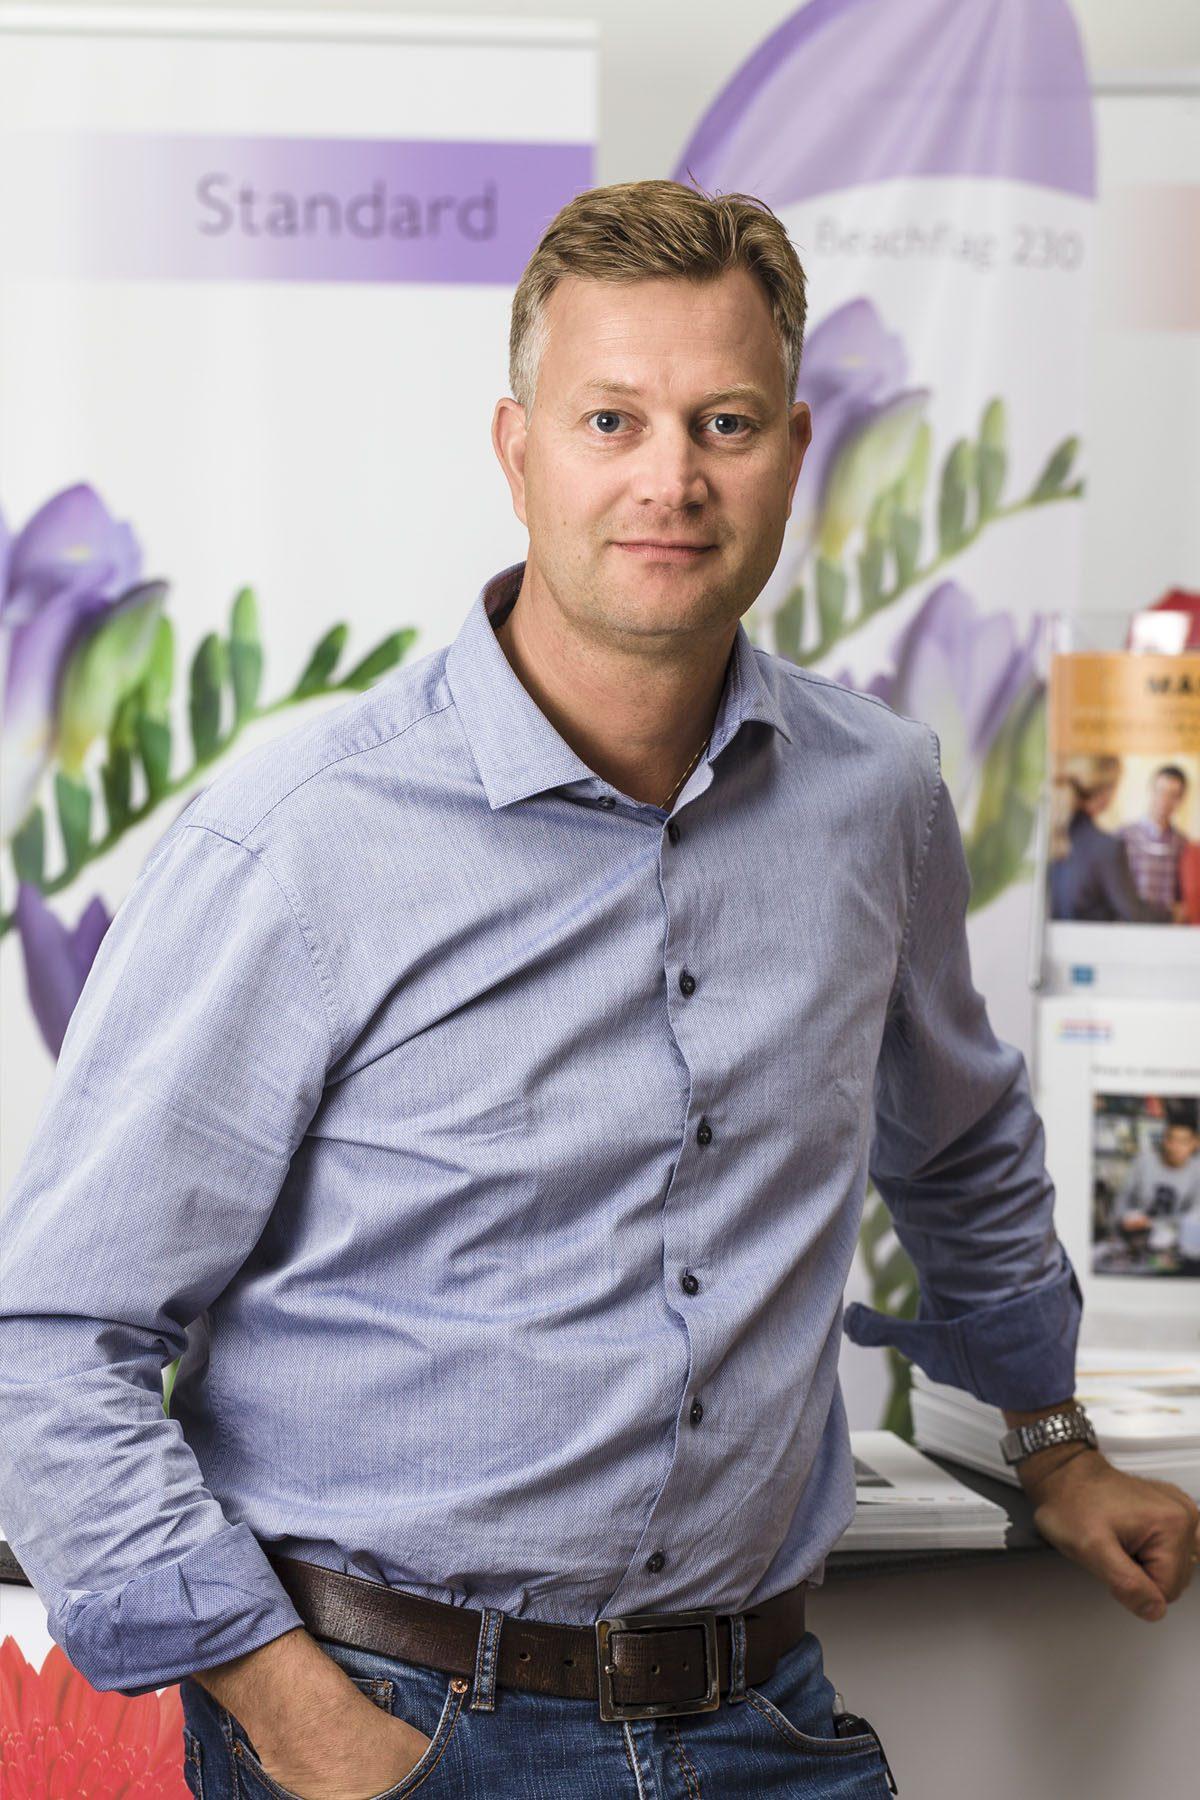 Martin Hedberg